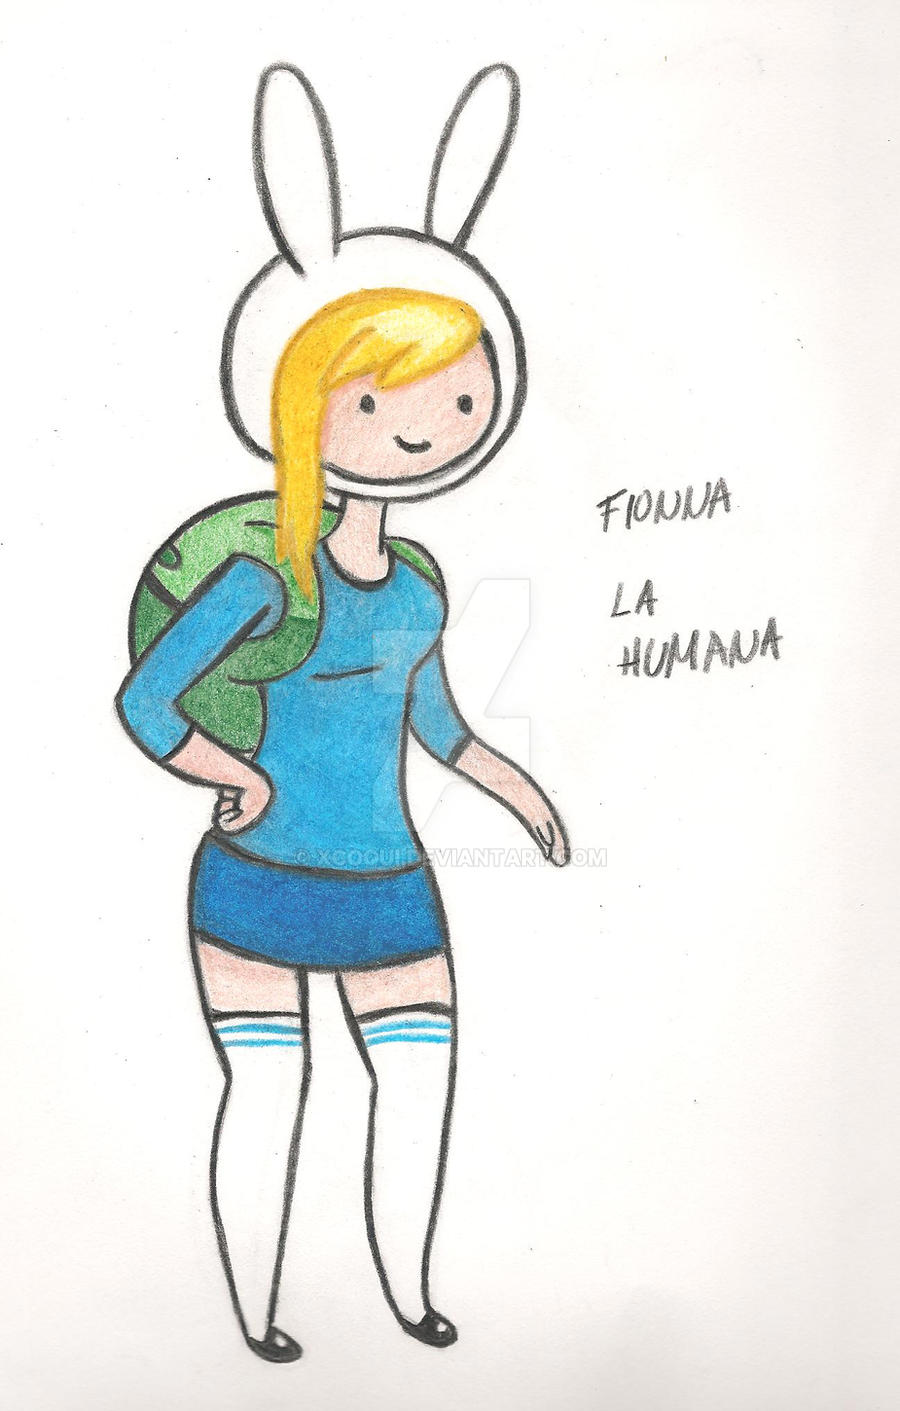 Fionna La Humana by Xcoqui